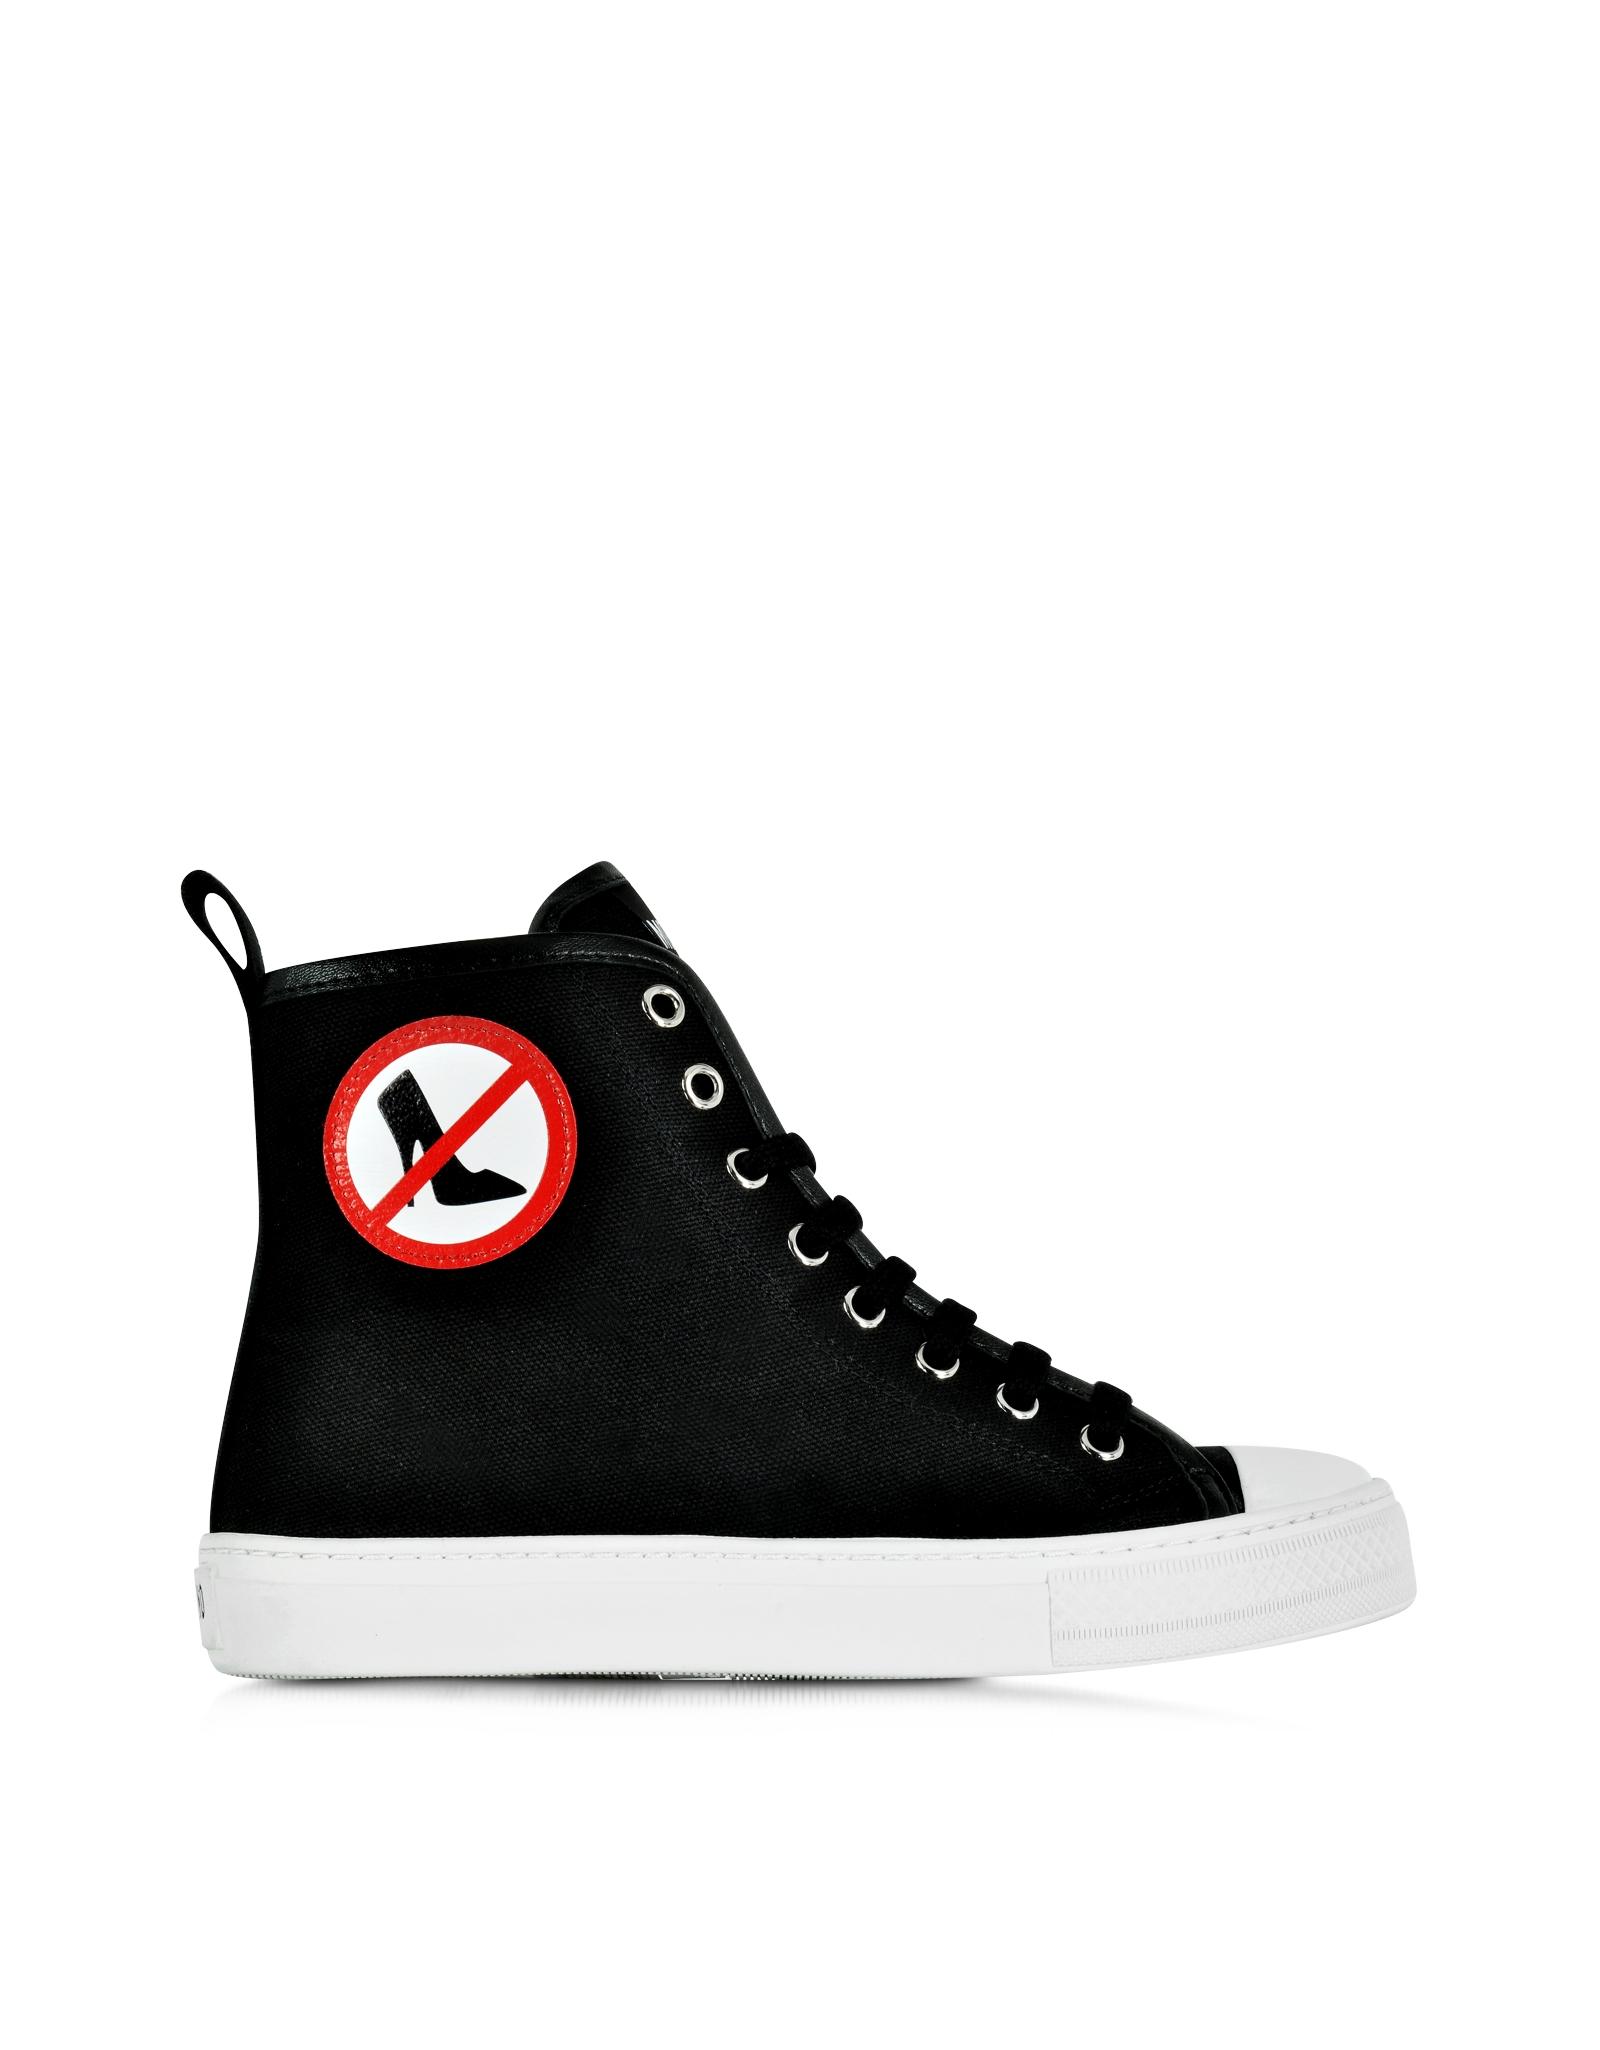 moschino no heels black canvas high top sneaker in